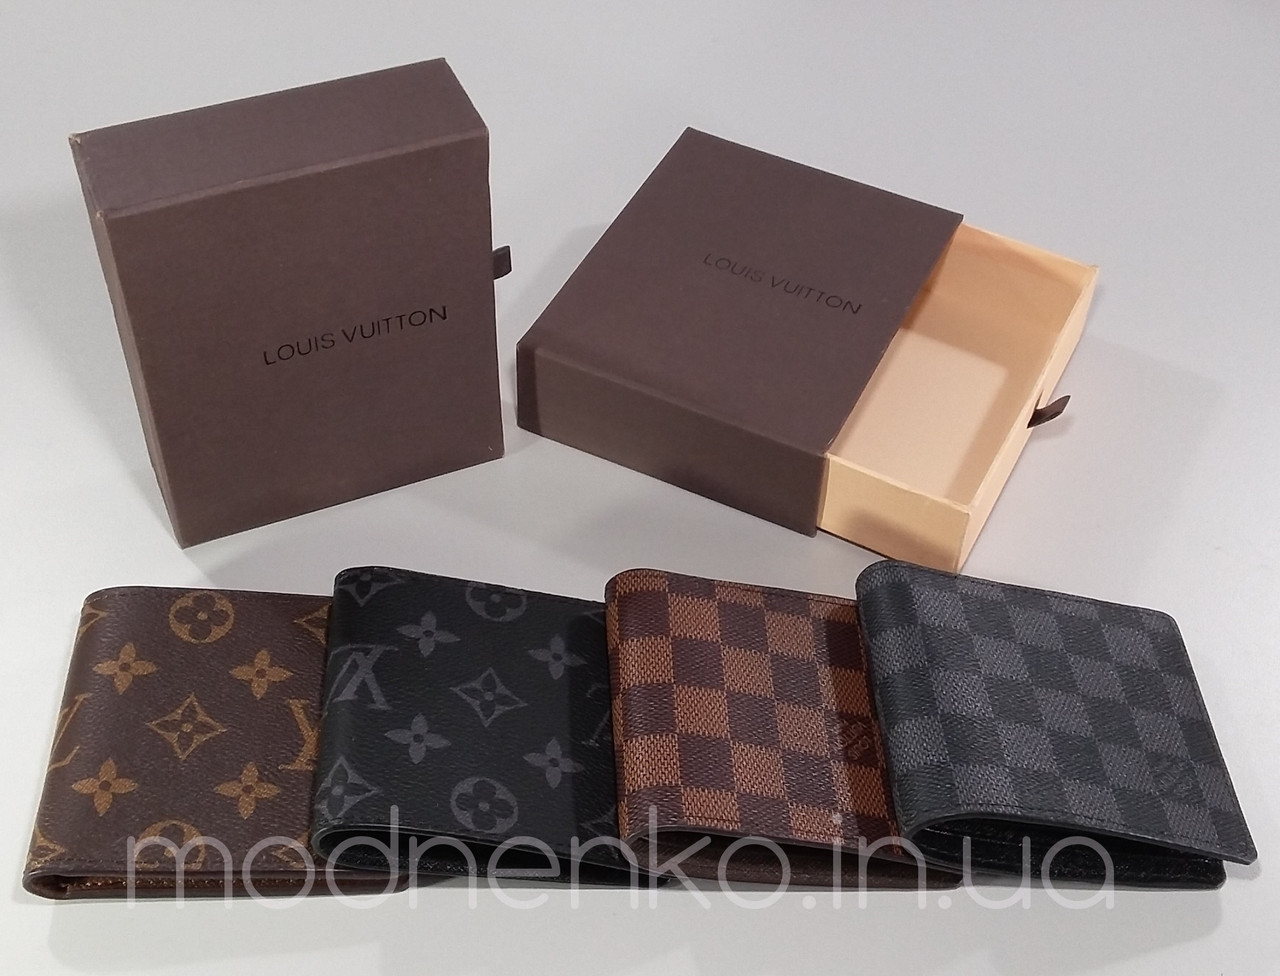 7fda2d35f03ce Кошелек портмоне Louis Vuitton (канва)  продажа